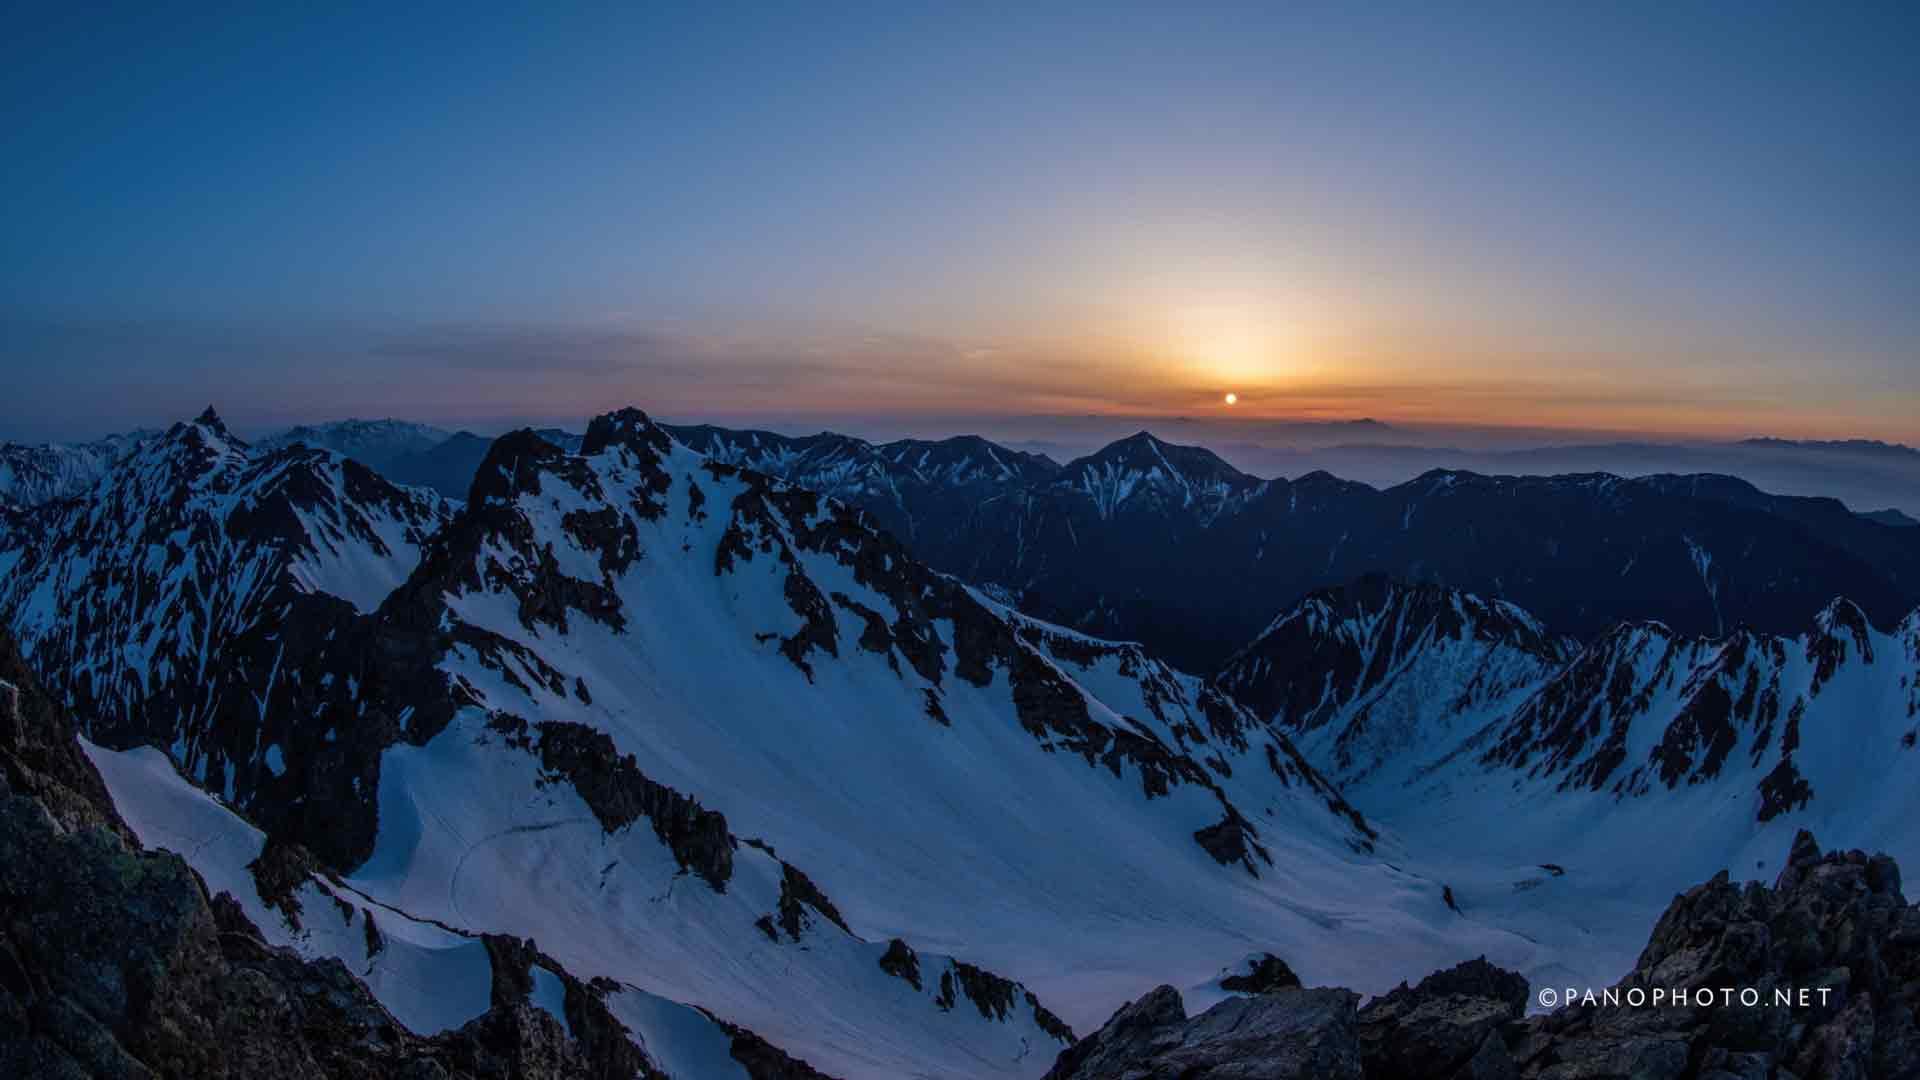 Sunrise view from Karasawadake Peak | Nikon D810 + Nikon AF Fisheye-Nikkor 16mm f/2.8D